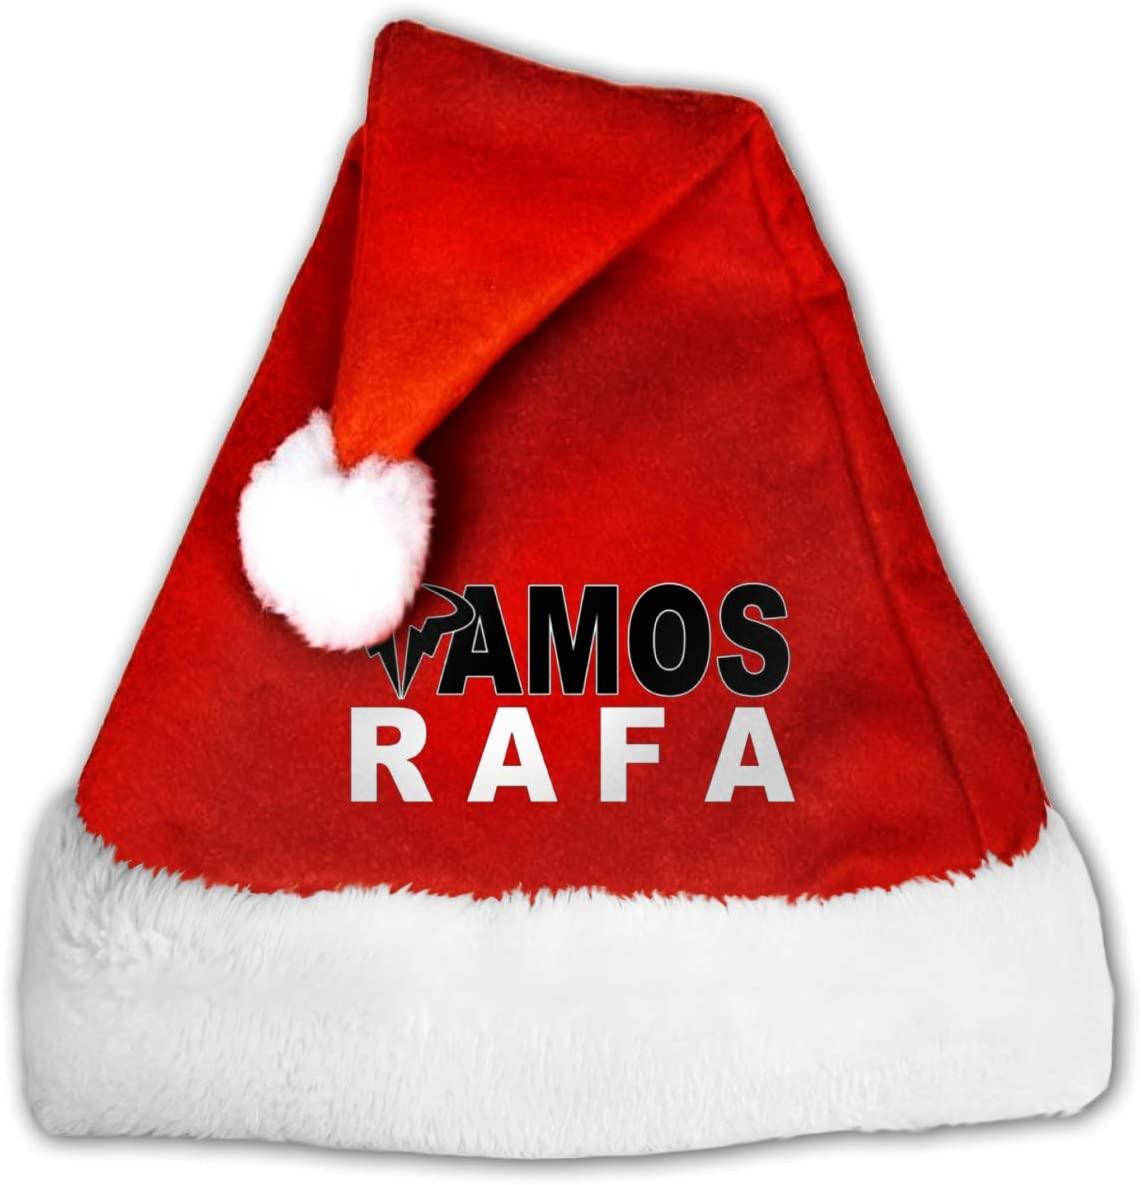 Adult Kid's Vamos RAFA Christmas Hat Red Plush Holiday Party Caps